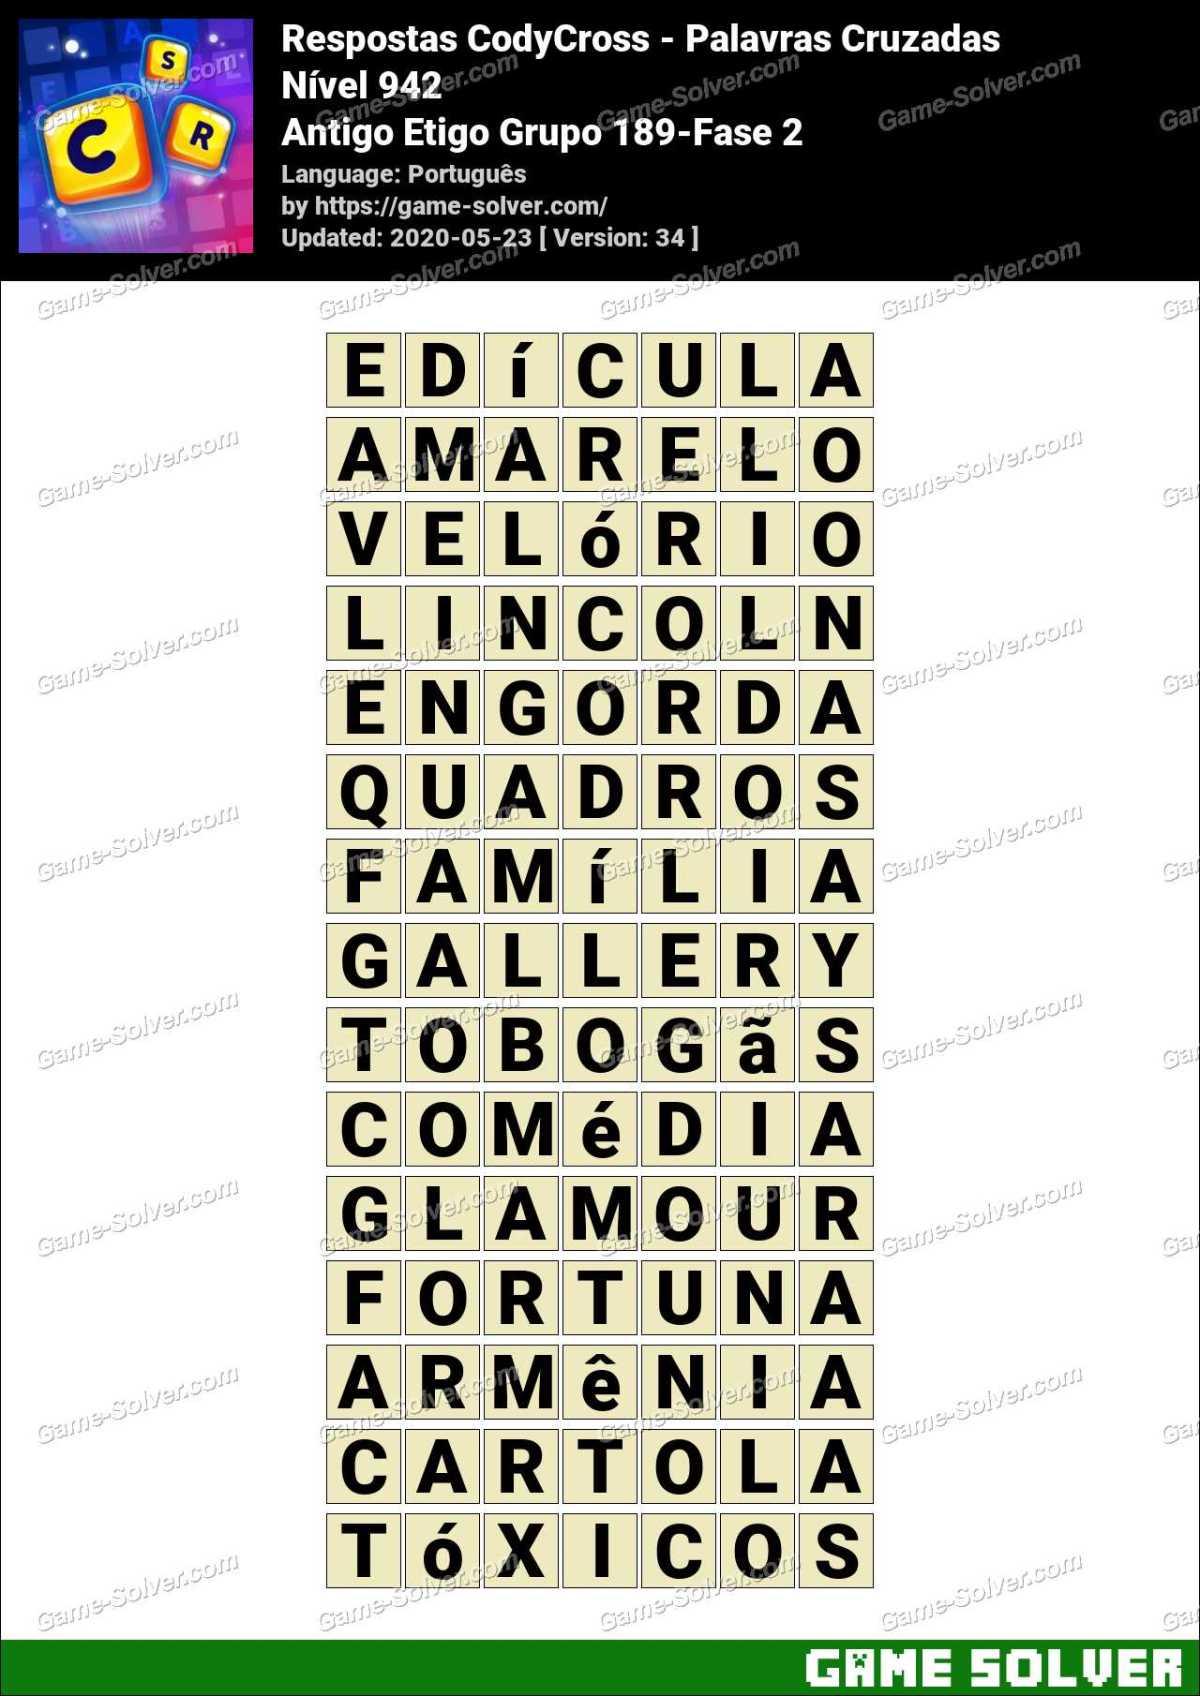 Respostas CodyCross Antigo Etigo Grupo 189-Fase 2